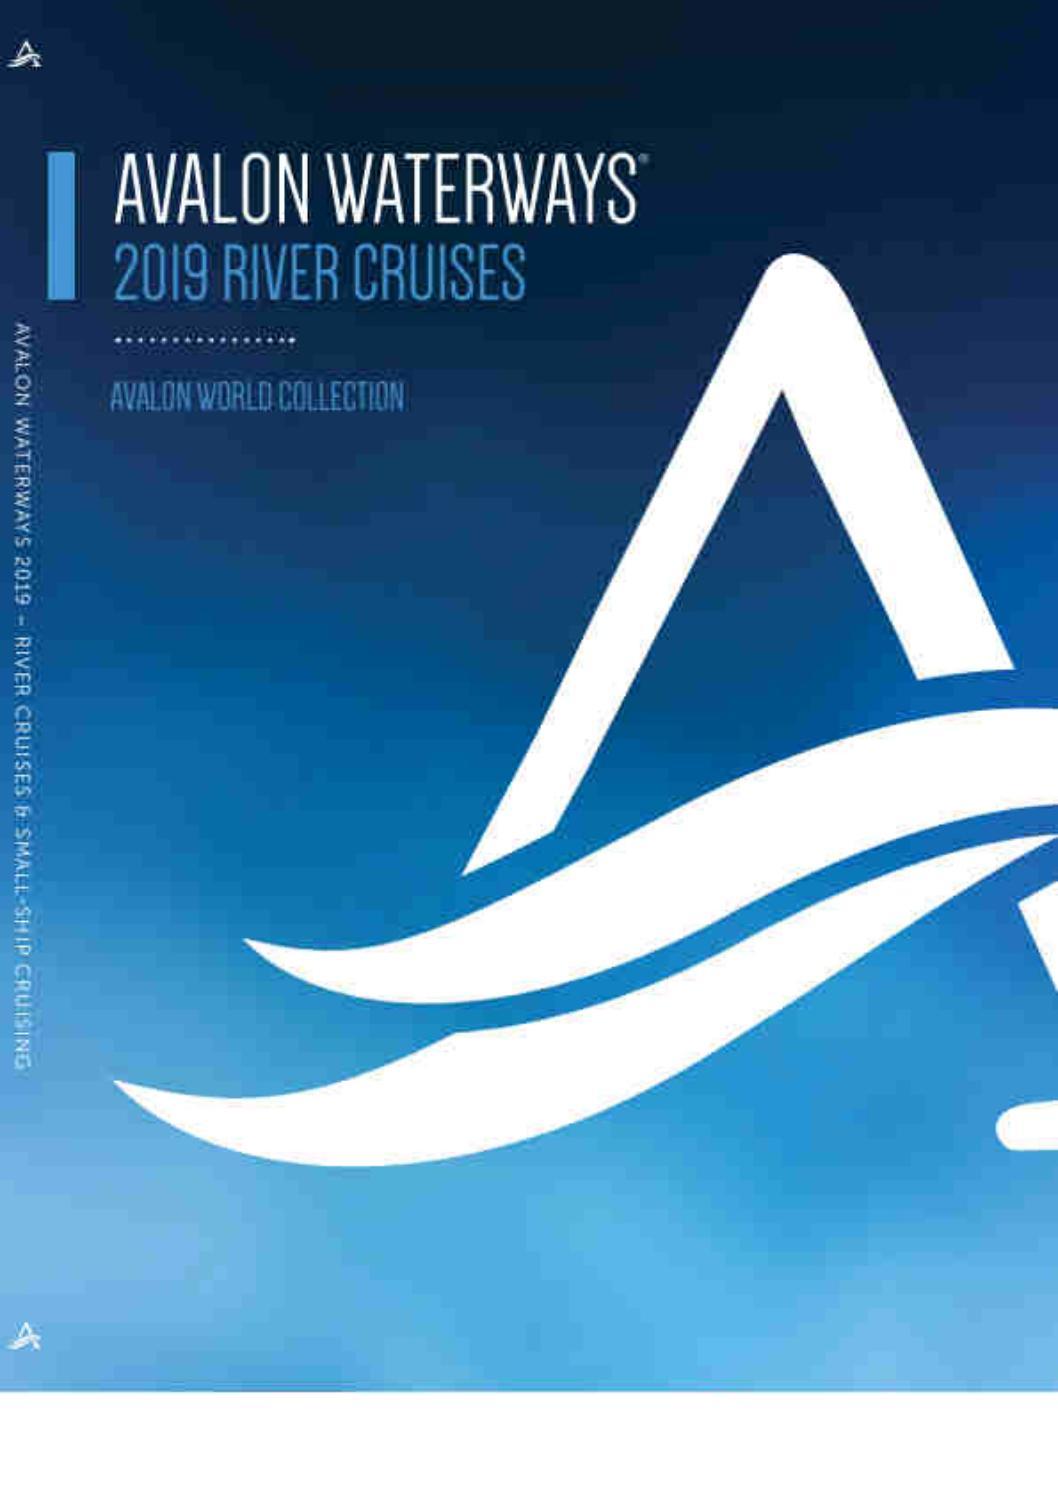 Avalon Waterways 2019 by Cia Marítima - issuu